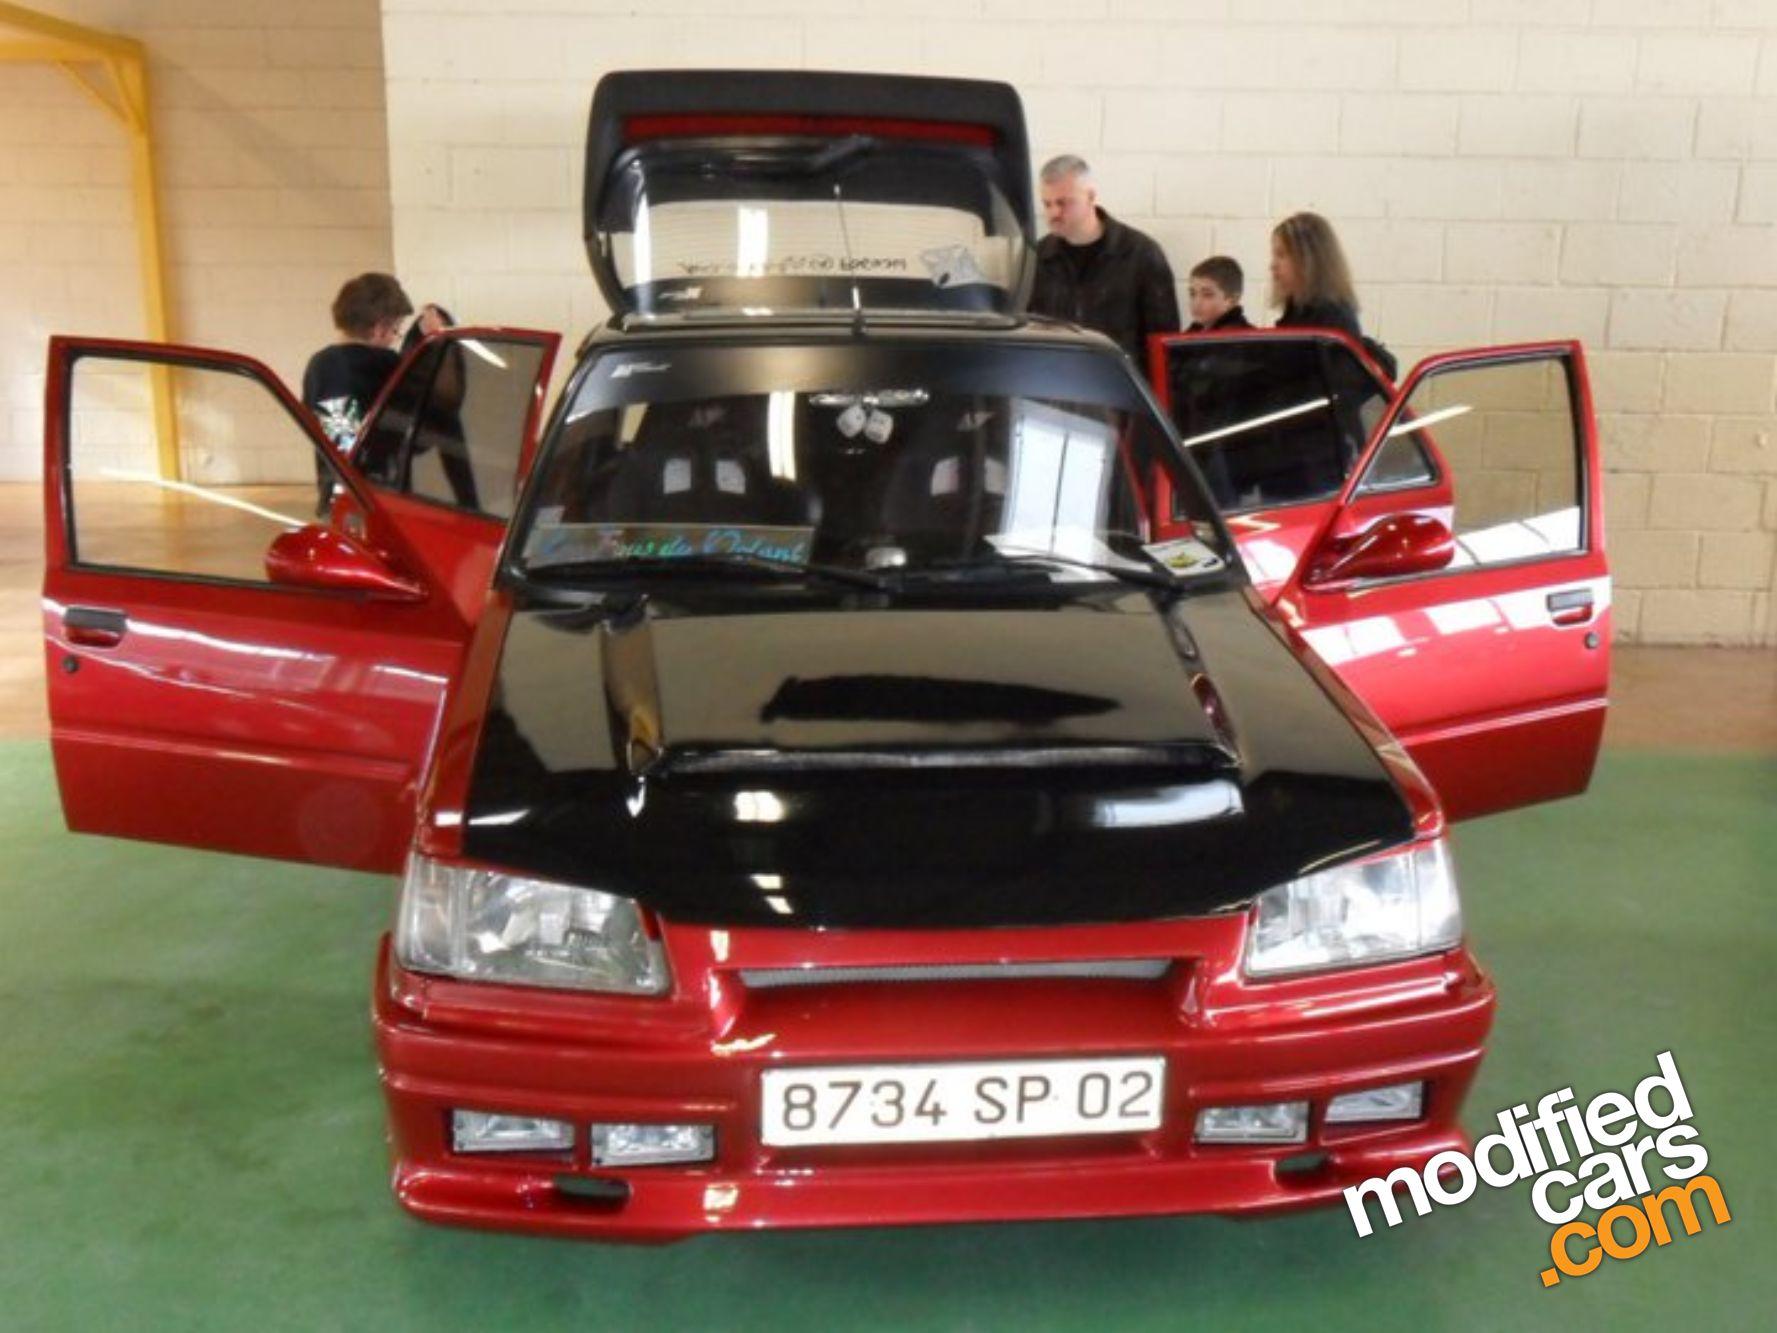 Photos Of Peugeot 309 1 1 Photo Tuning Peugeot 309 11 06 Jpg Gr8autophoto Com